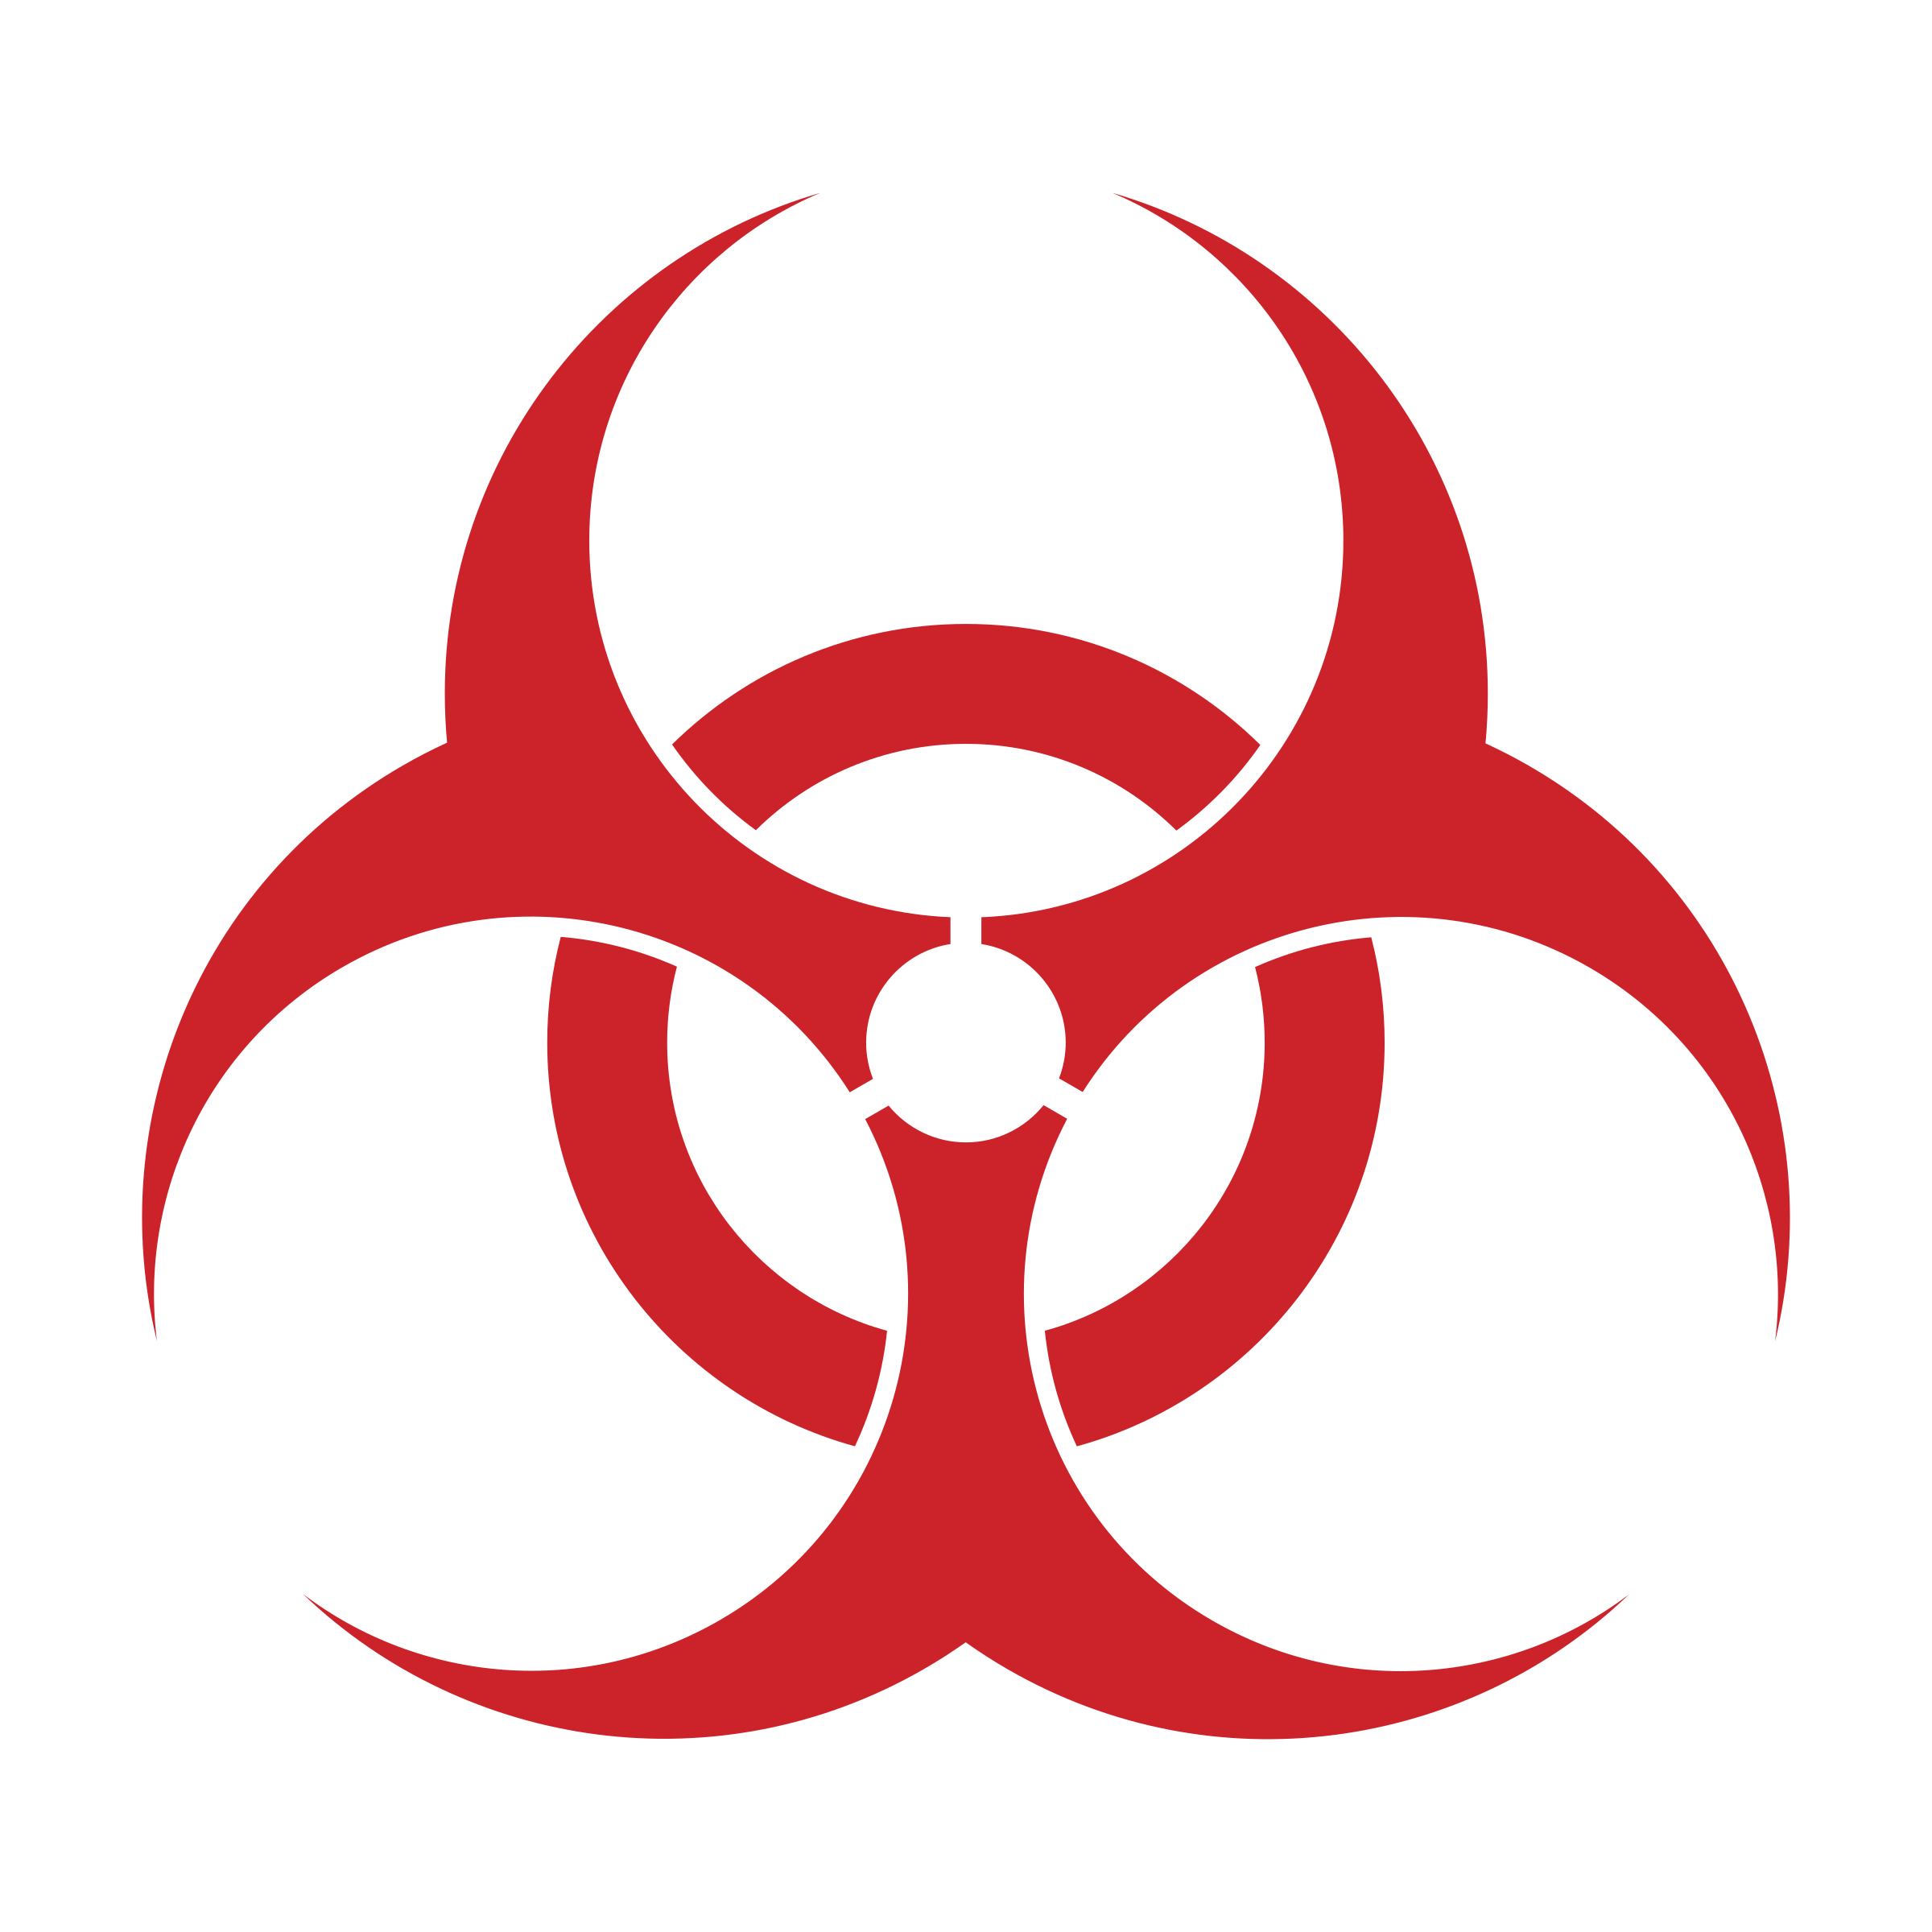 biohazard logo png transparent svg vector freebie supply rh freebiesupply com biohazard logo png biohazard logo origin